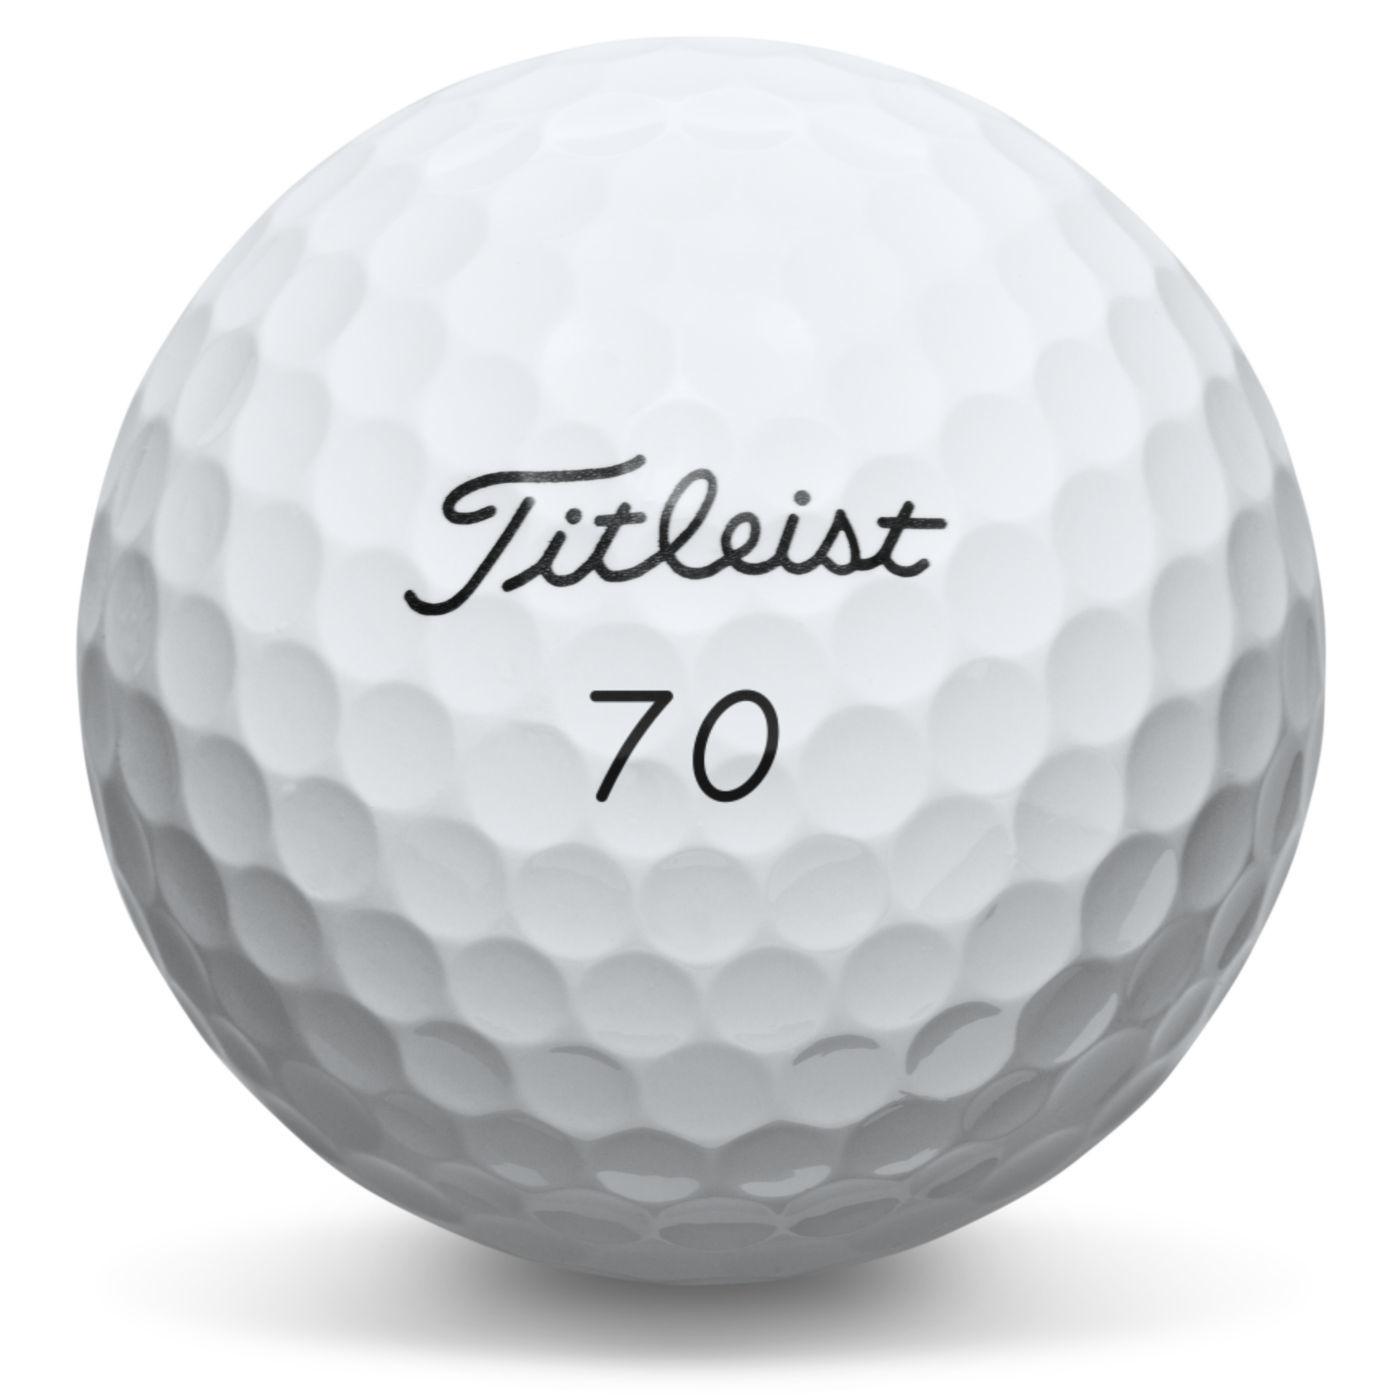 https://www.best4balls.com/pub/media/catalog/product/p/r/pro_v1_special_play_70_3.jpg